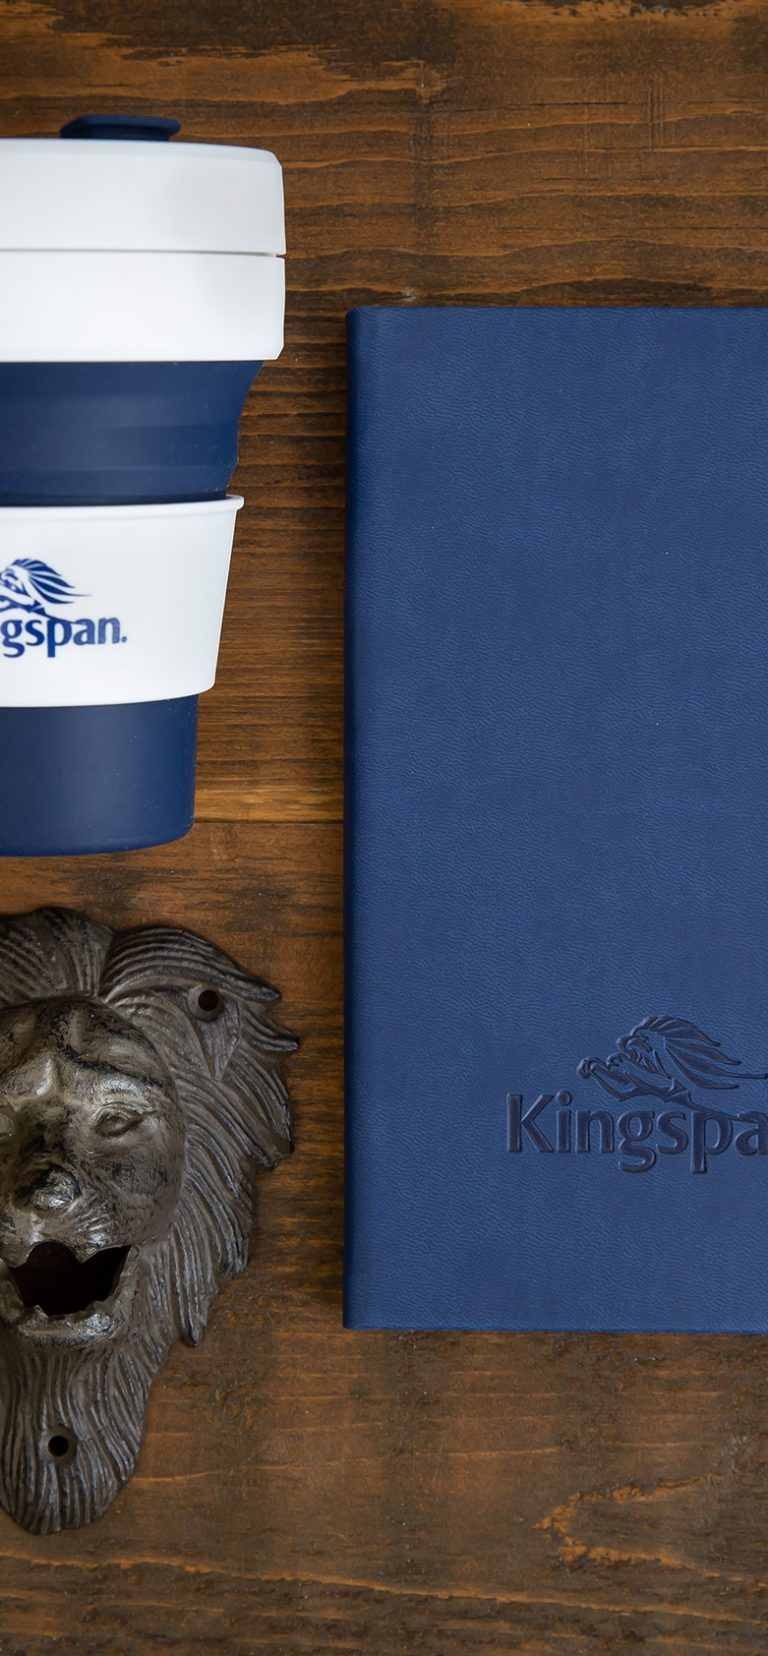 Kingspan Products